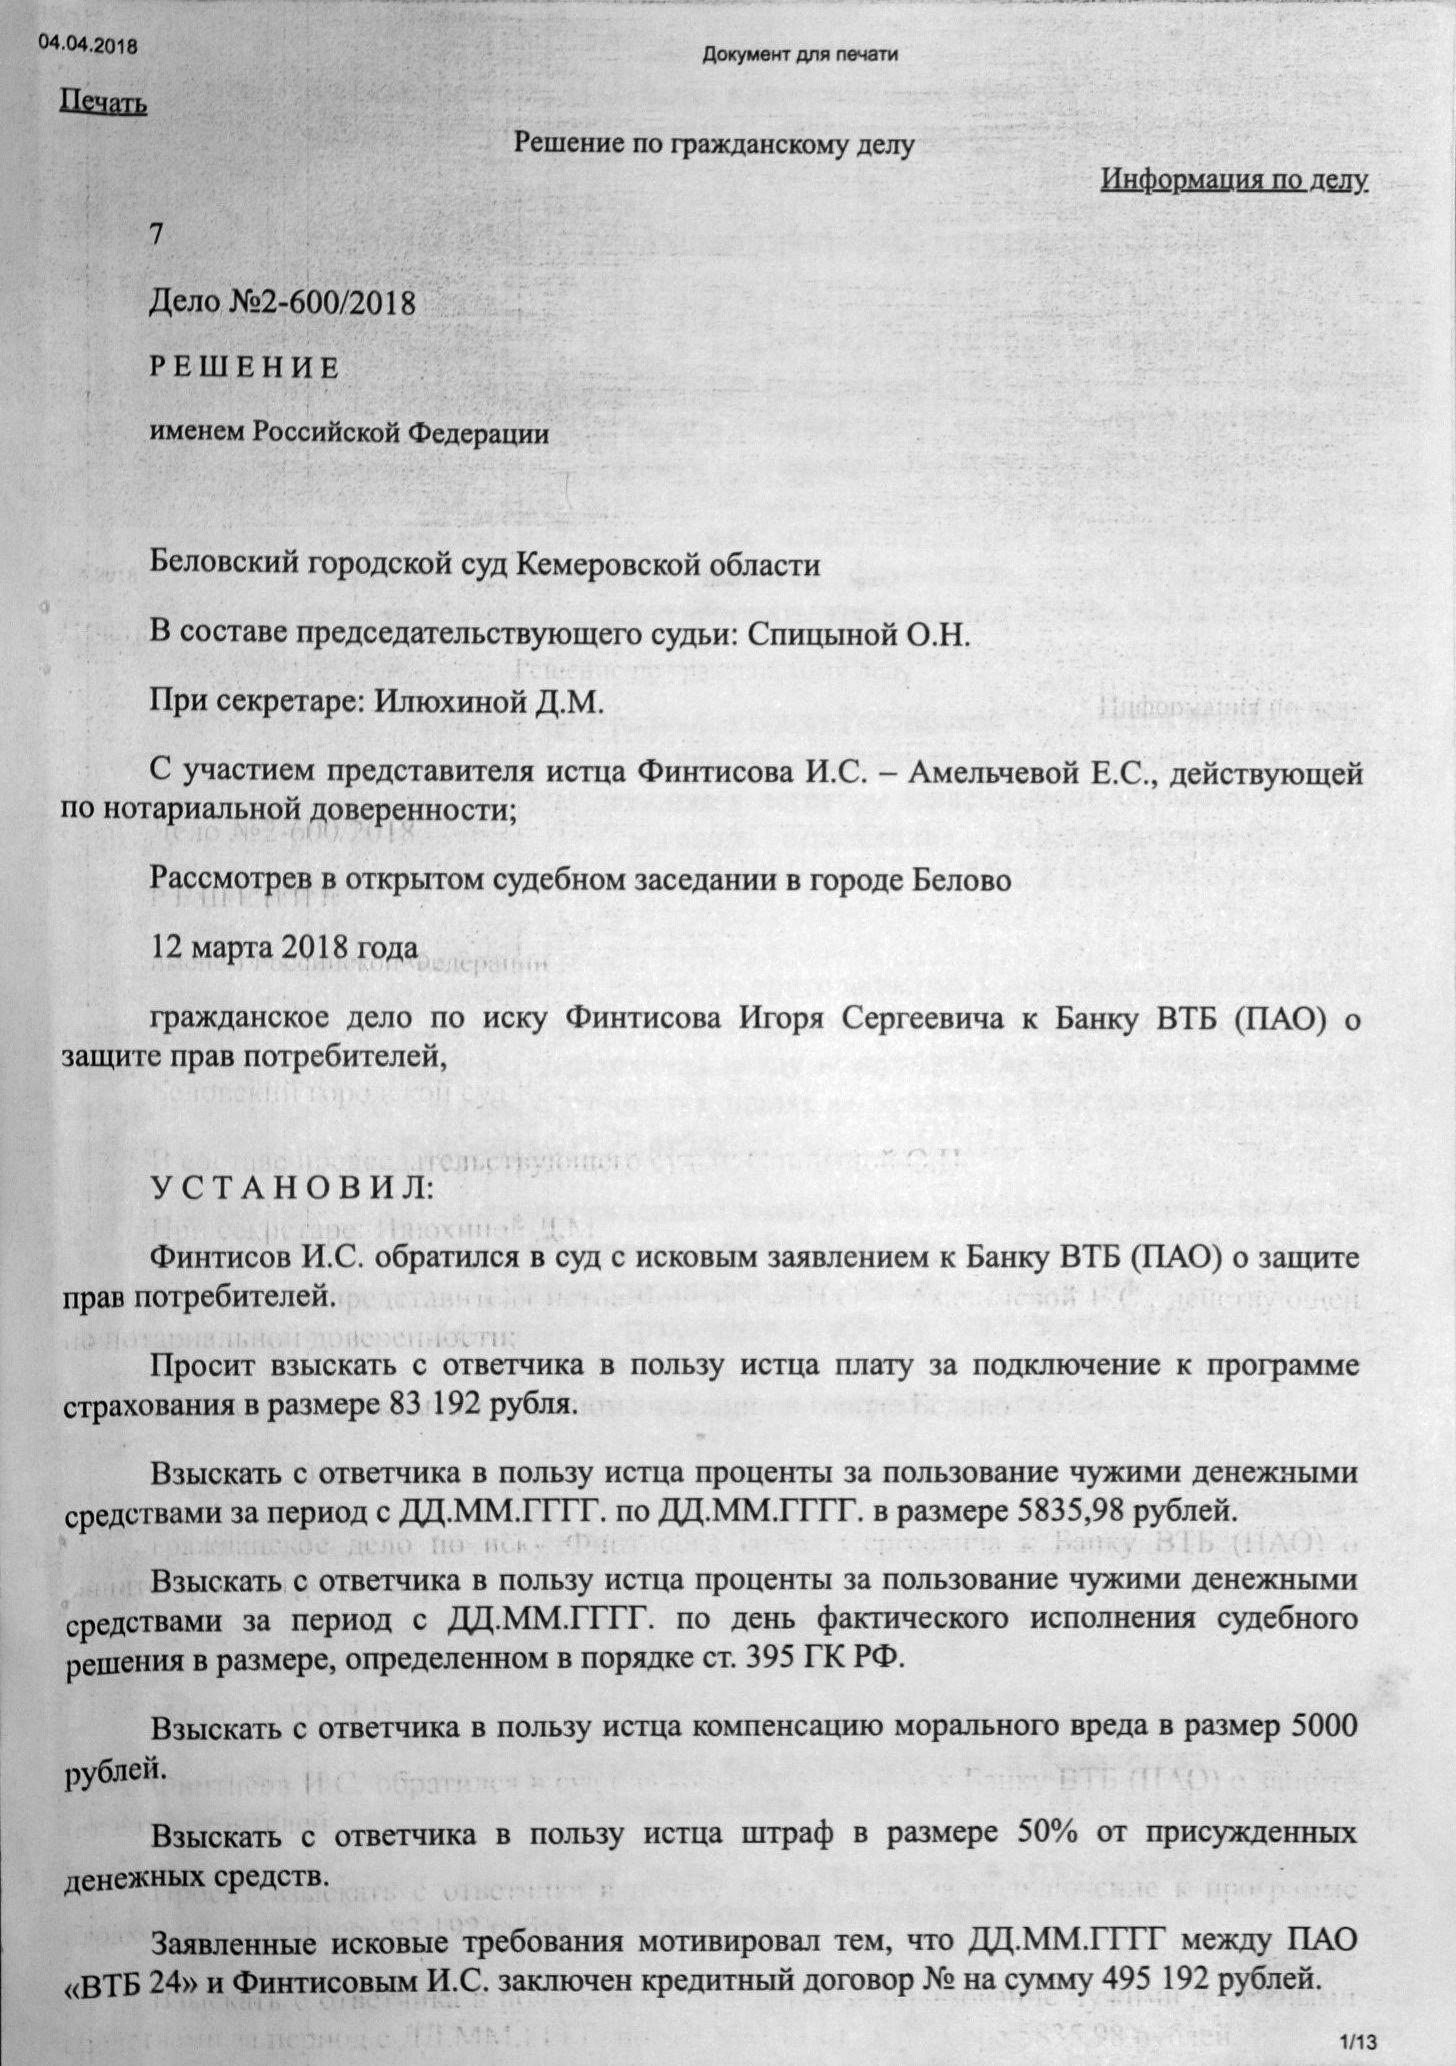 Решение по делу № 2-600/2018 от 12.03.2018 г.